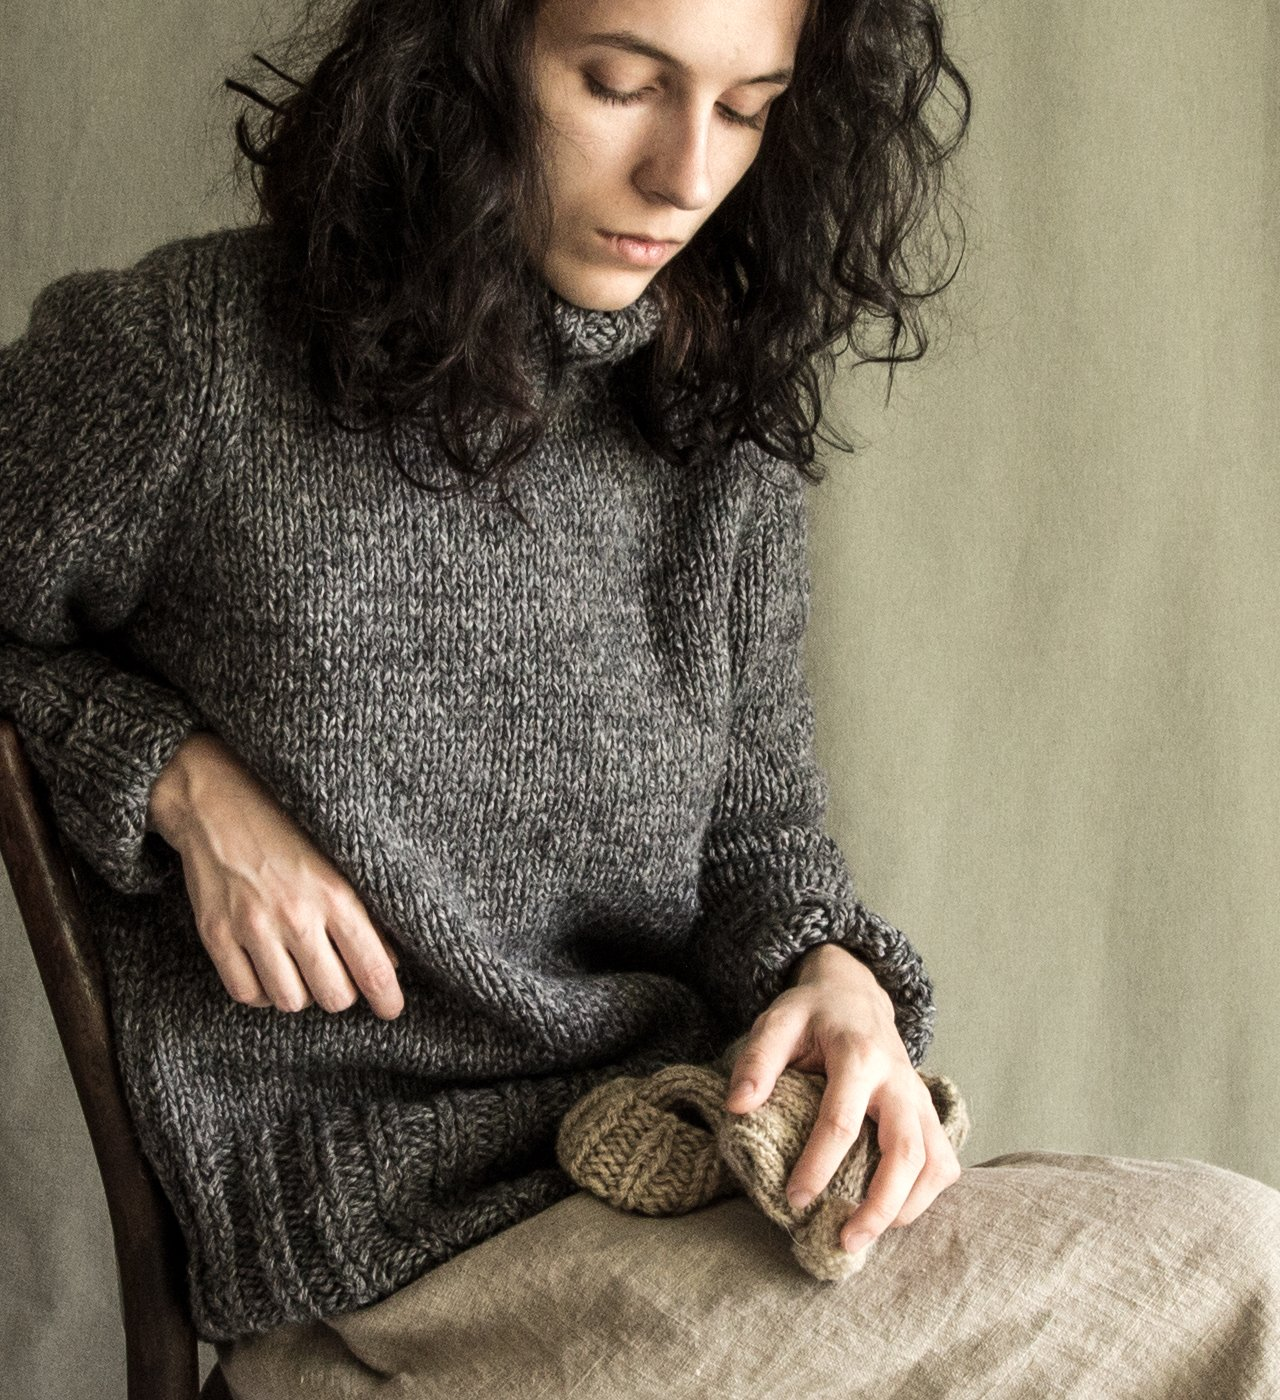 Winter sweater woolen sweater grey sweater natural wool winter jumper crocheted sweater wool knit cardigan women's charcoal knitted vest